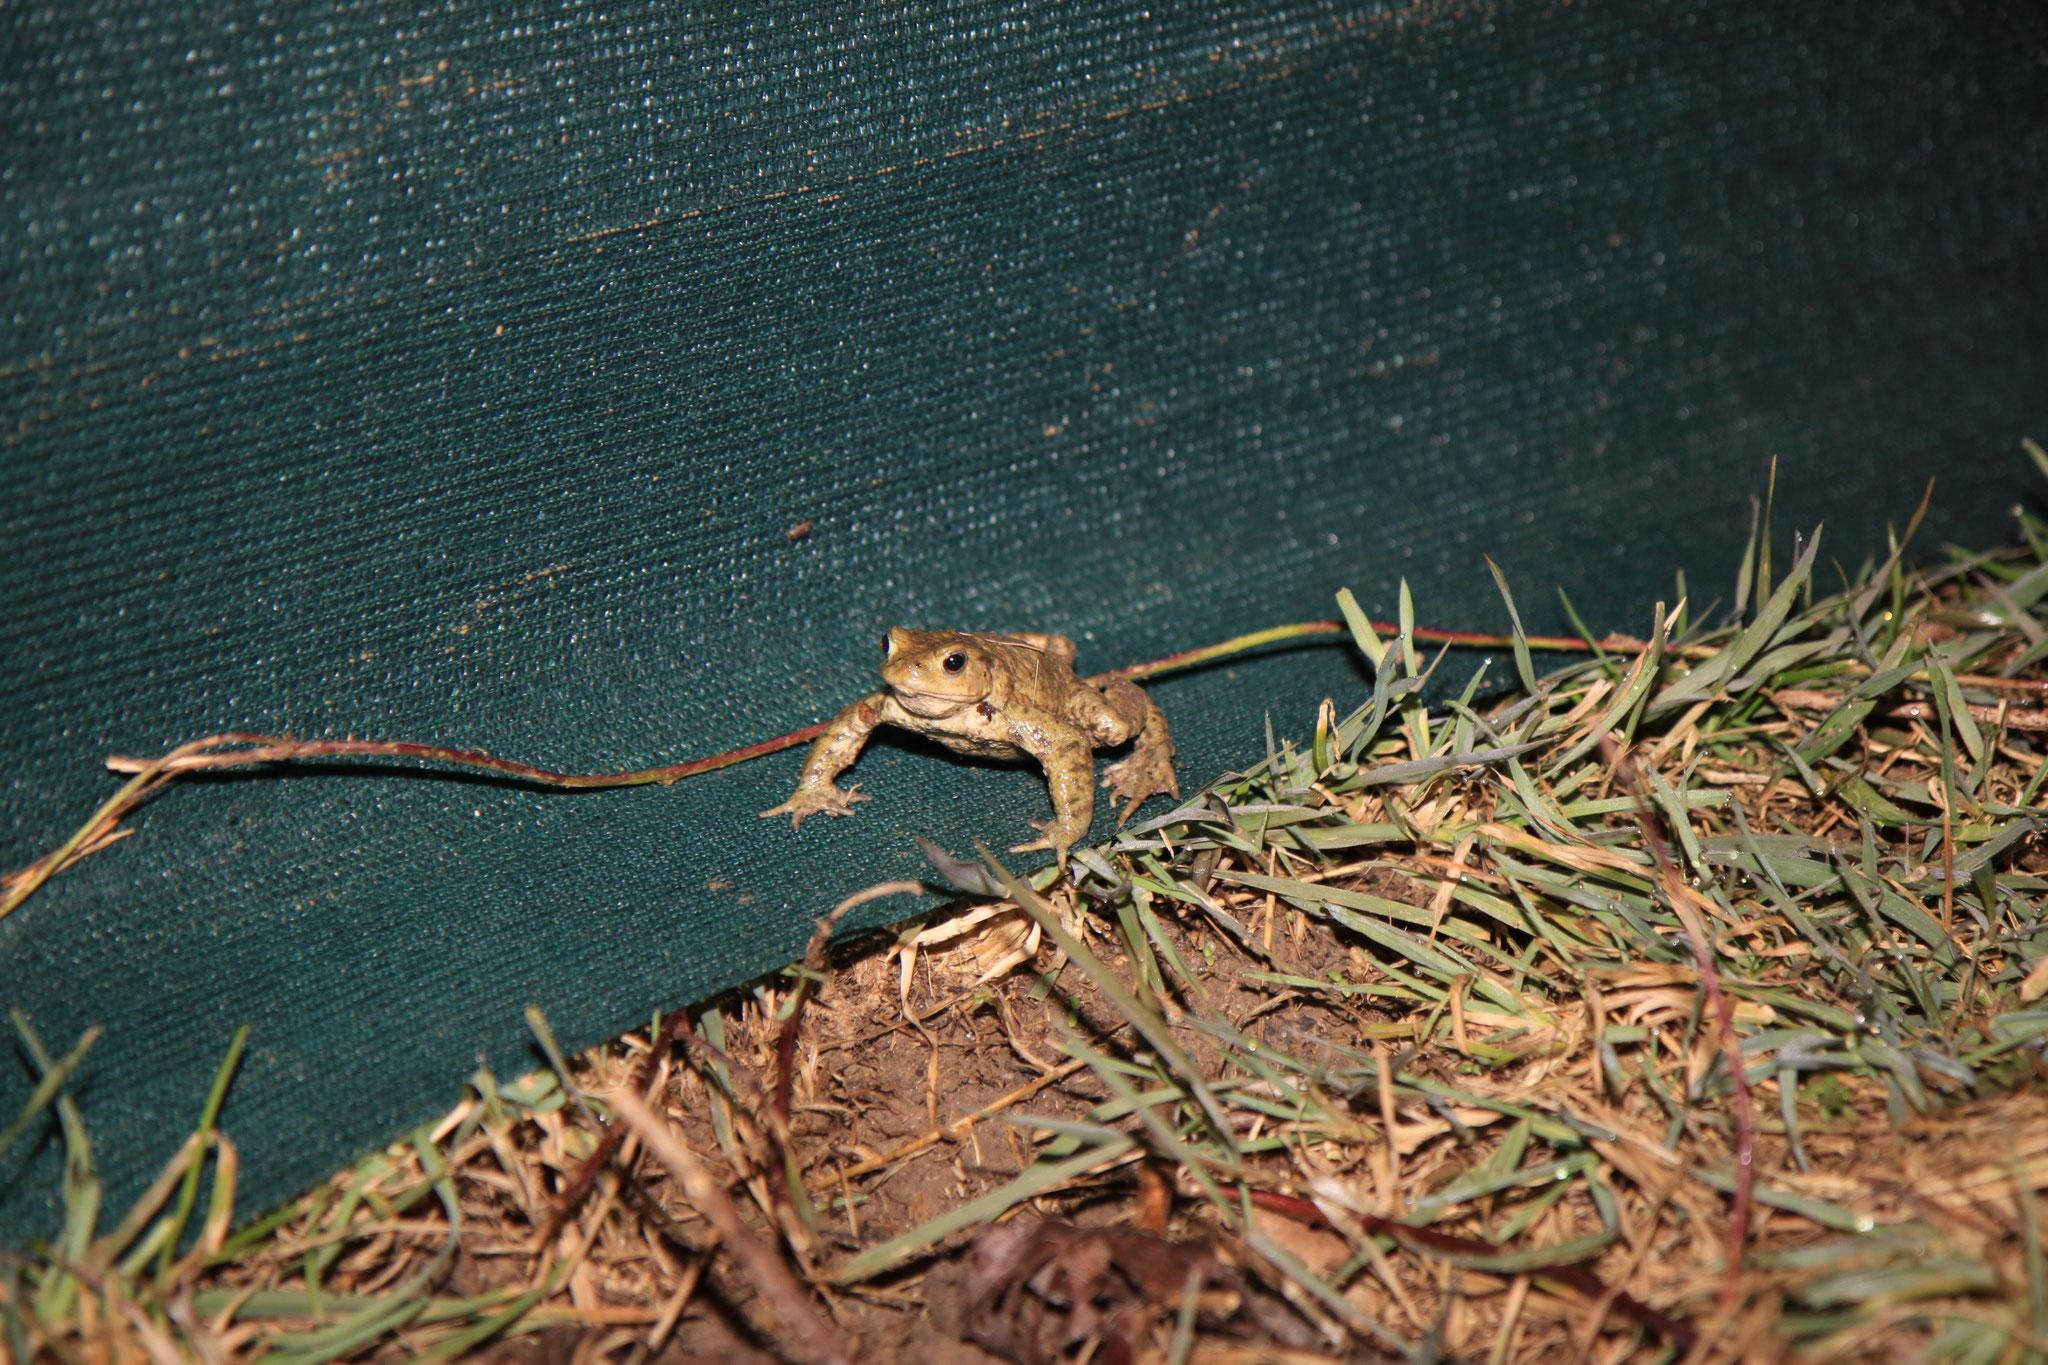 Die Erdkröten laufen schön entlang des Gewebeplansockels. (Foto: B. Budig)